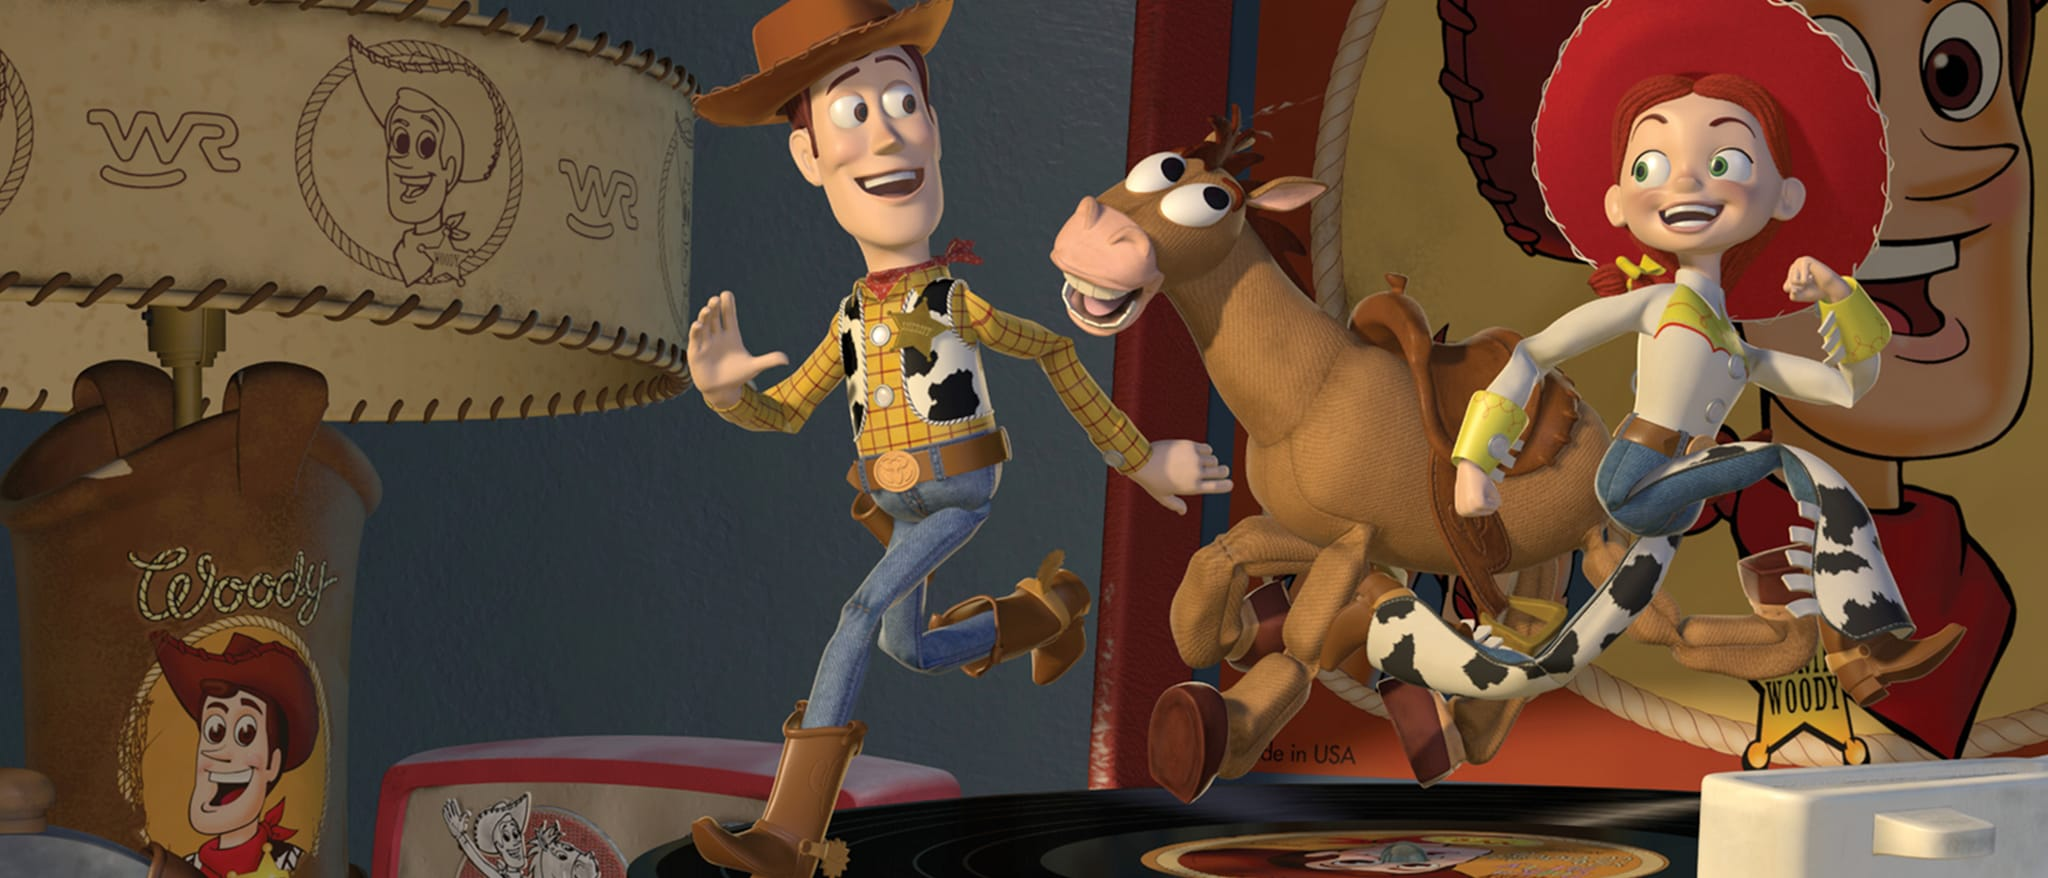 Toy Story 2 Hero